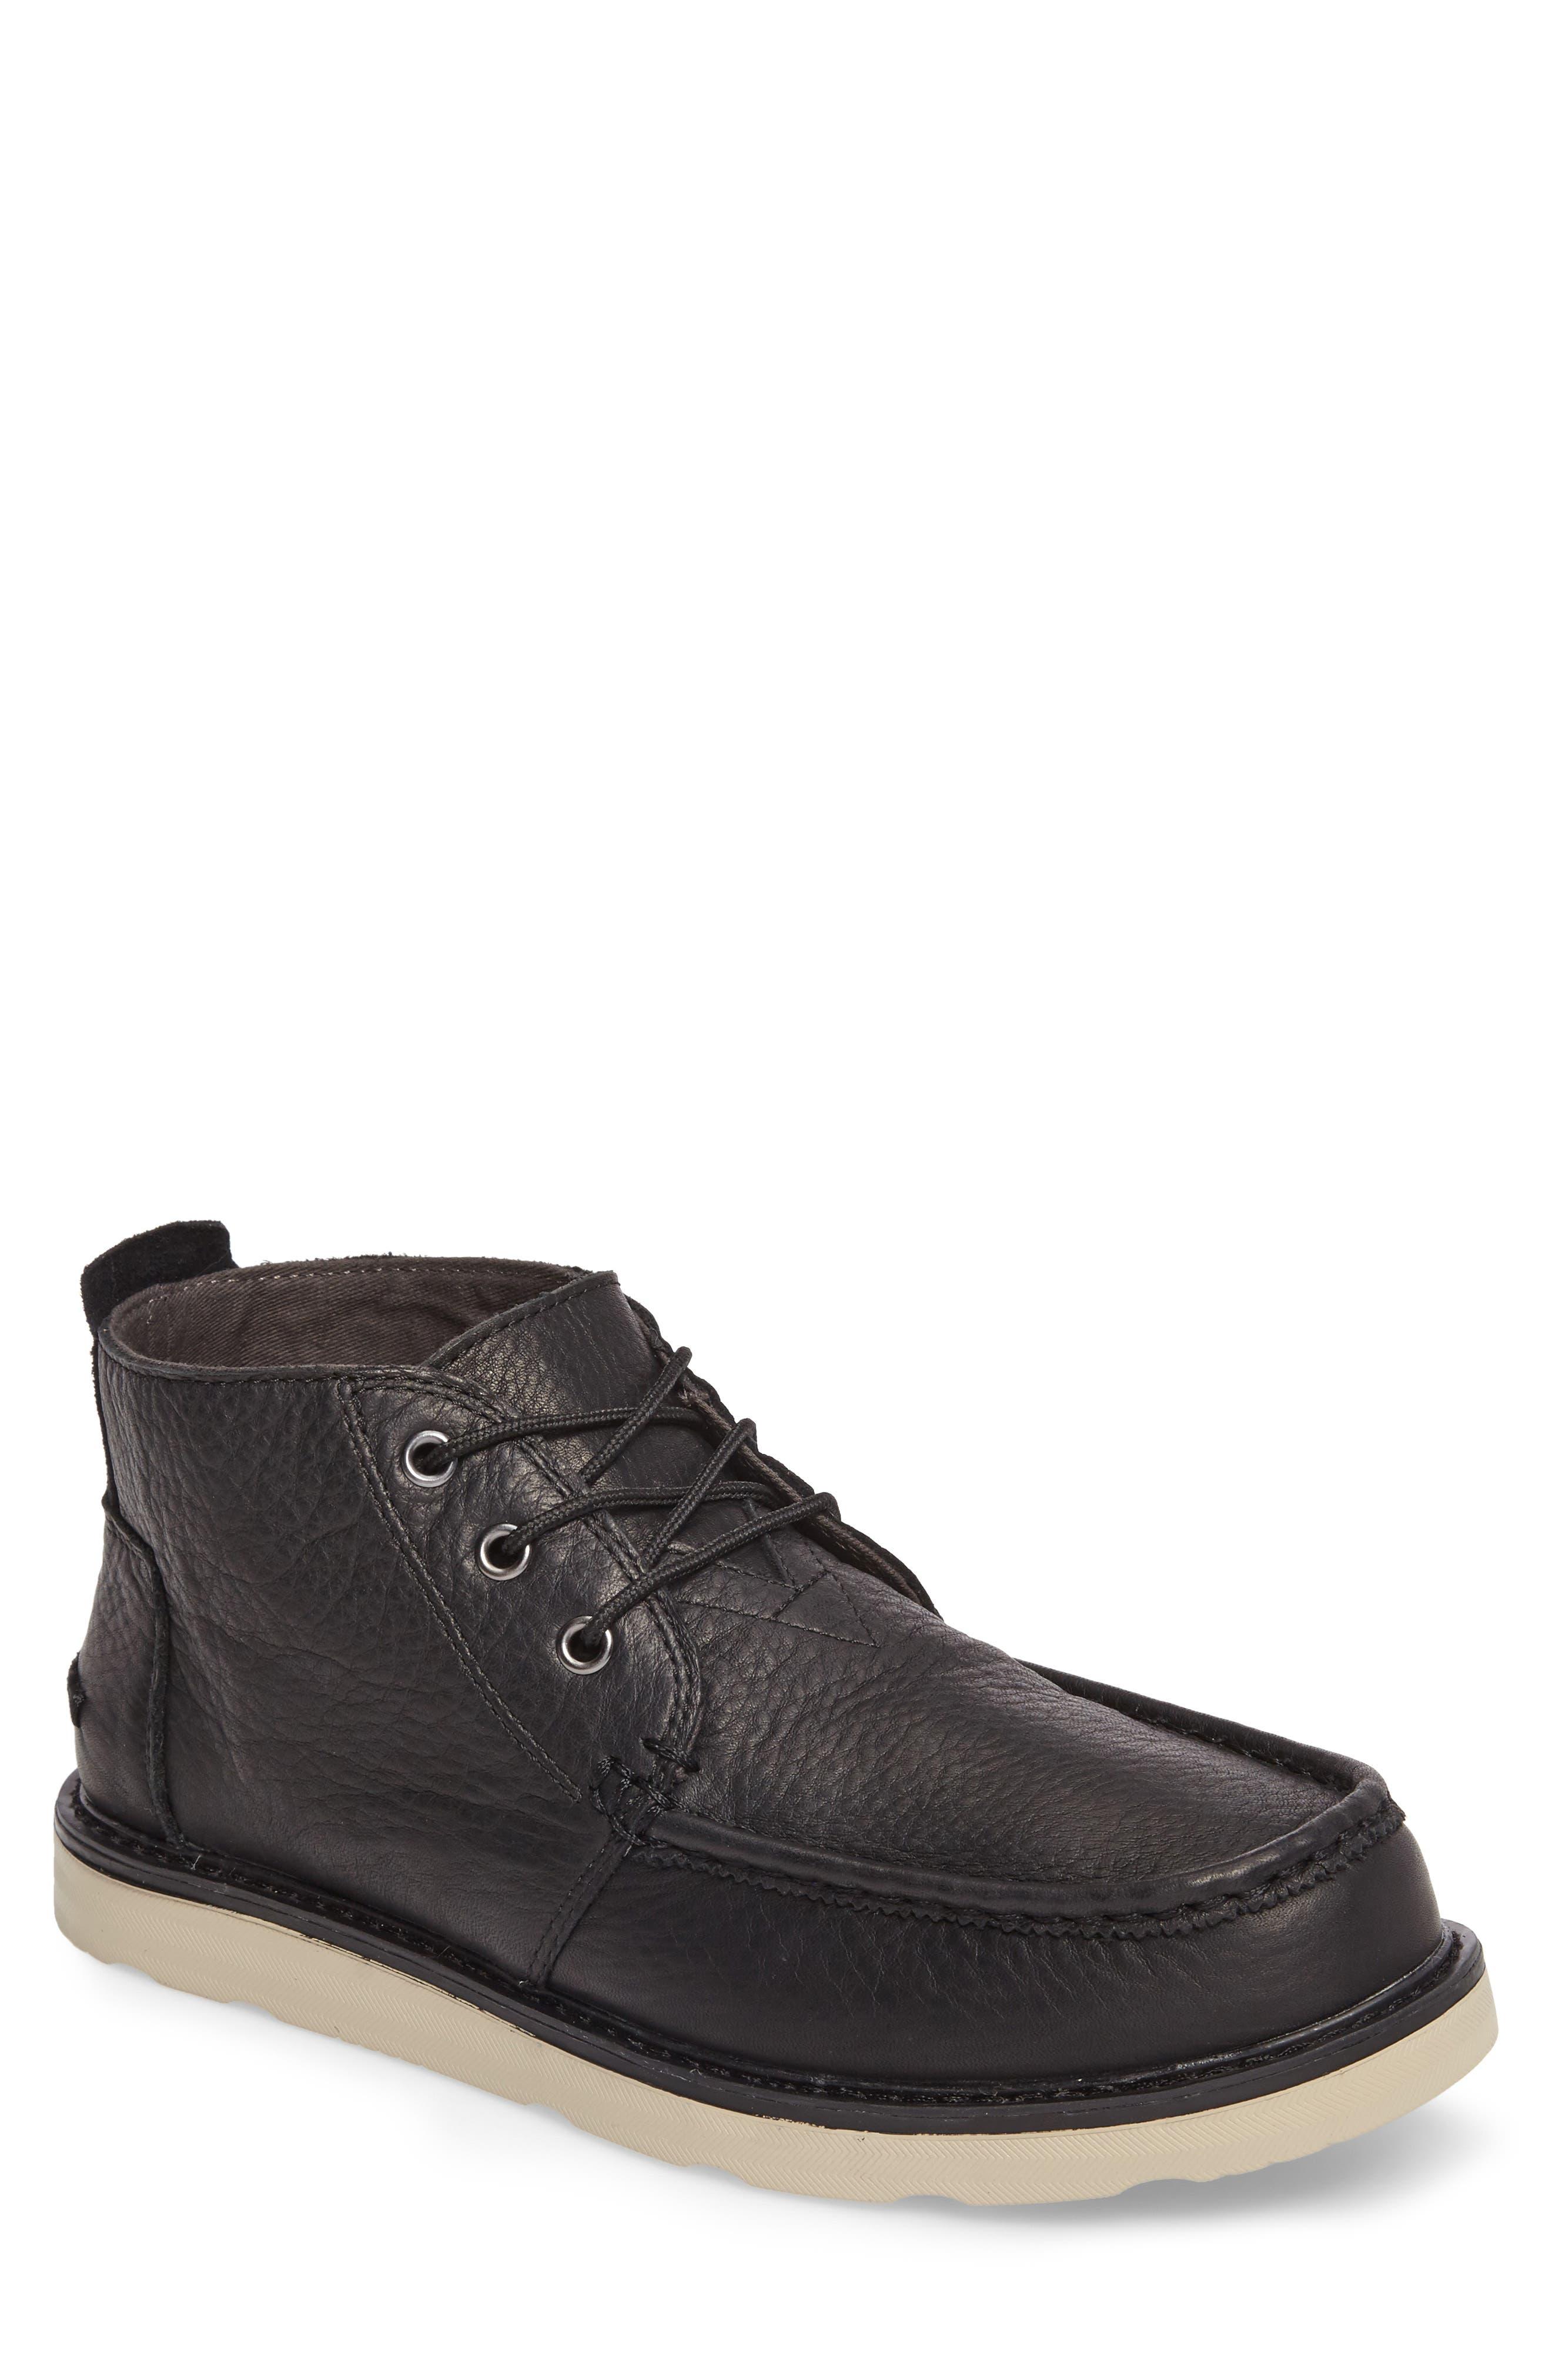 Chukka Boot,                         Main,                         color, Black/Black Leather